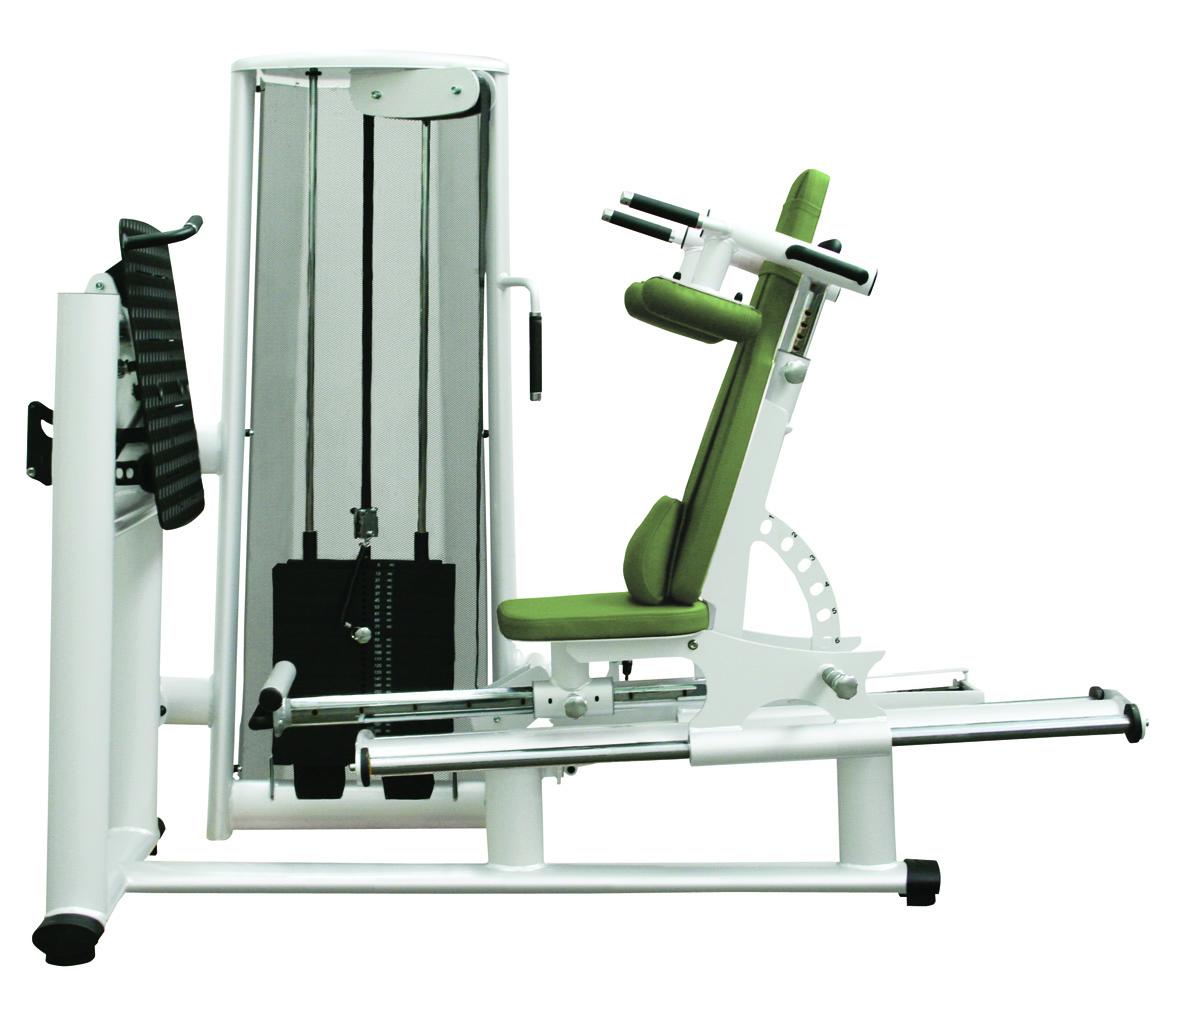 Тренажер - Жим ногами реабилитационный (сидя, лёжа) Gym80 Medical Leg Press seated, lying